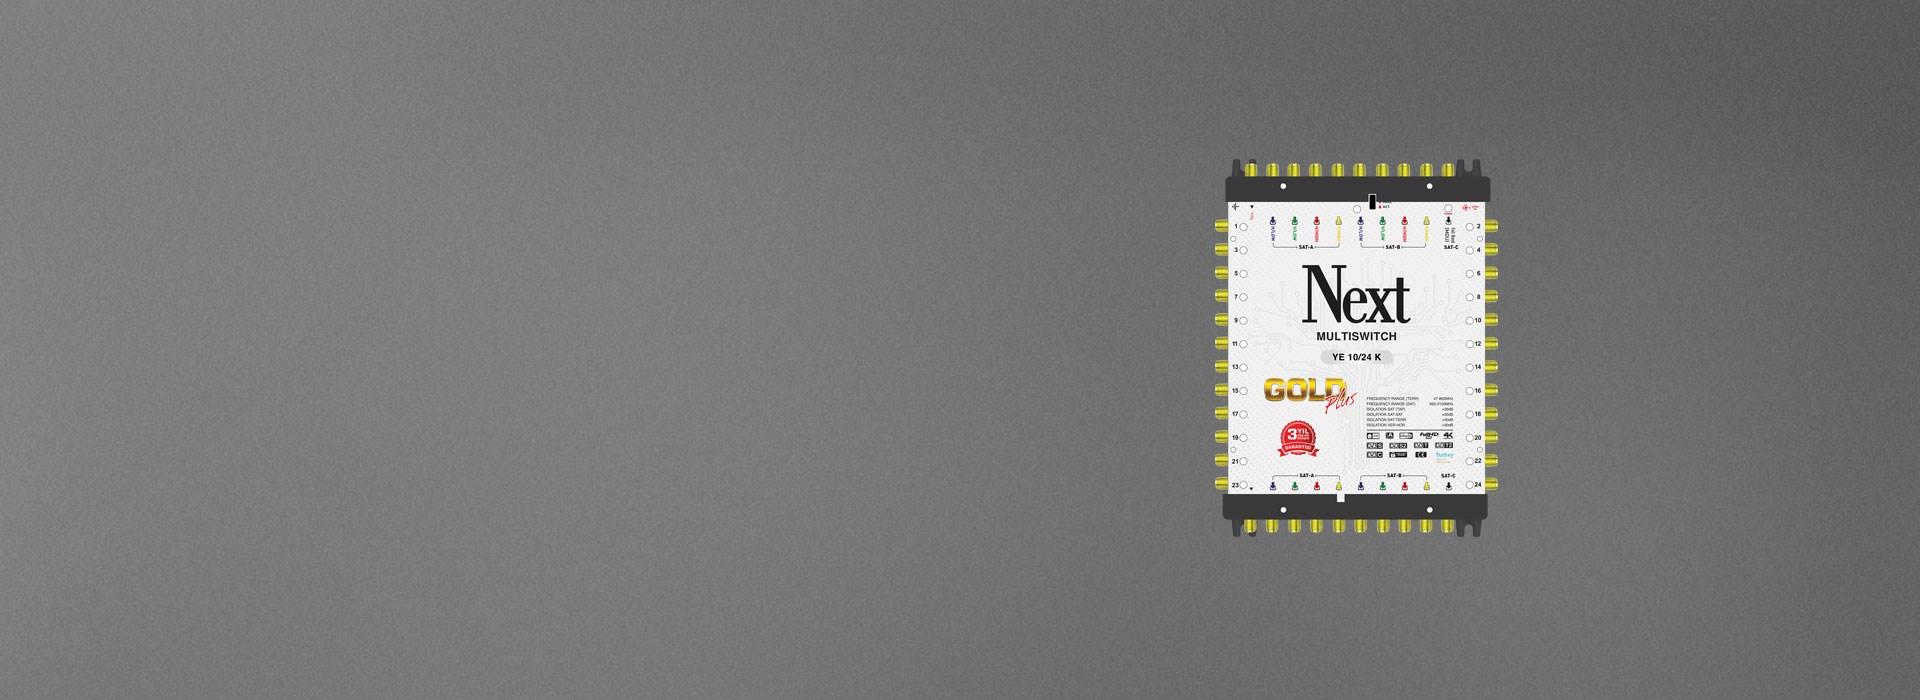 Next Multiswitch YE-10/24-K GOLD PLUS